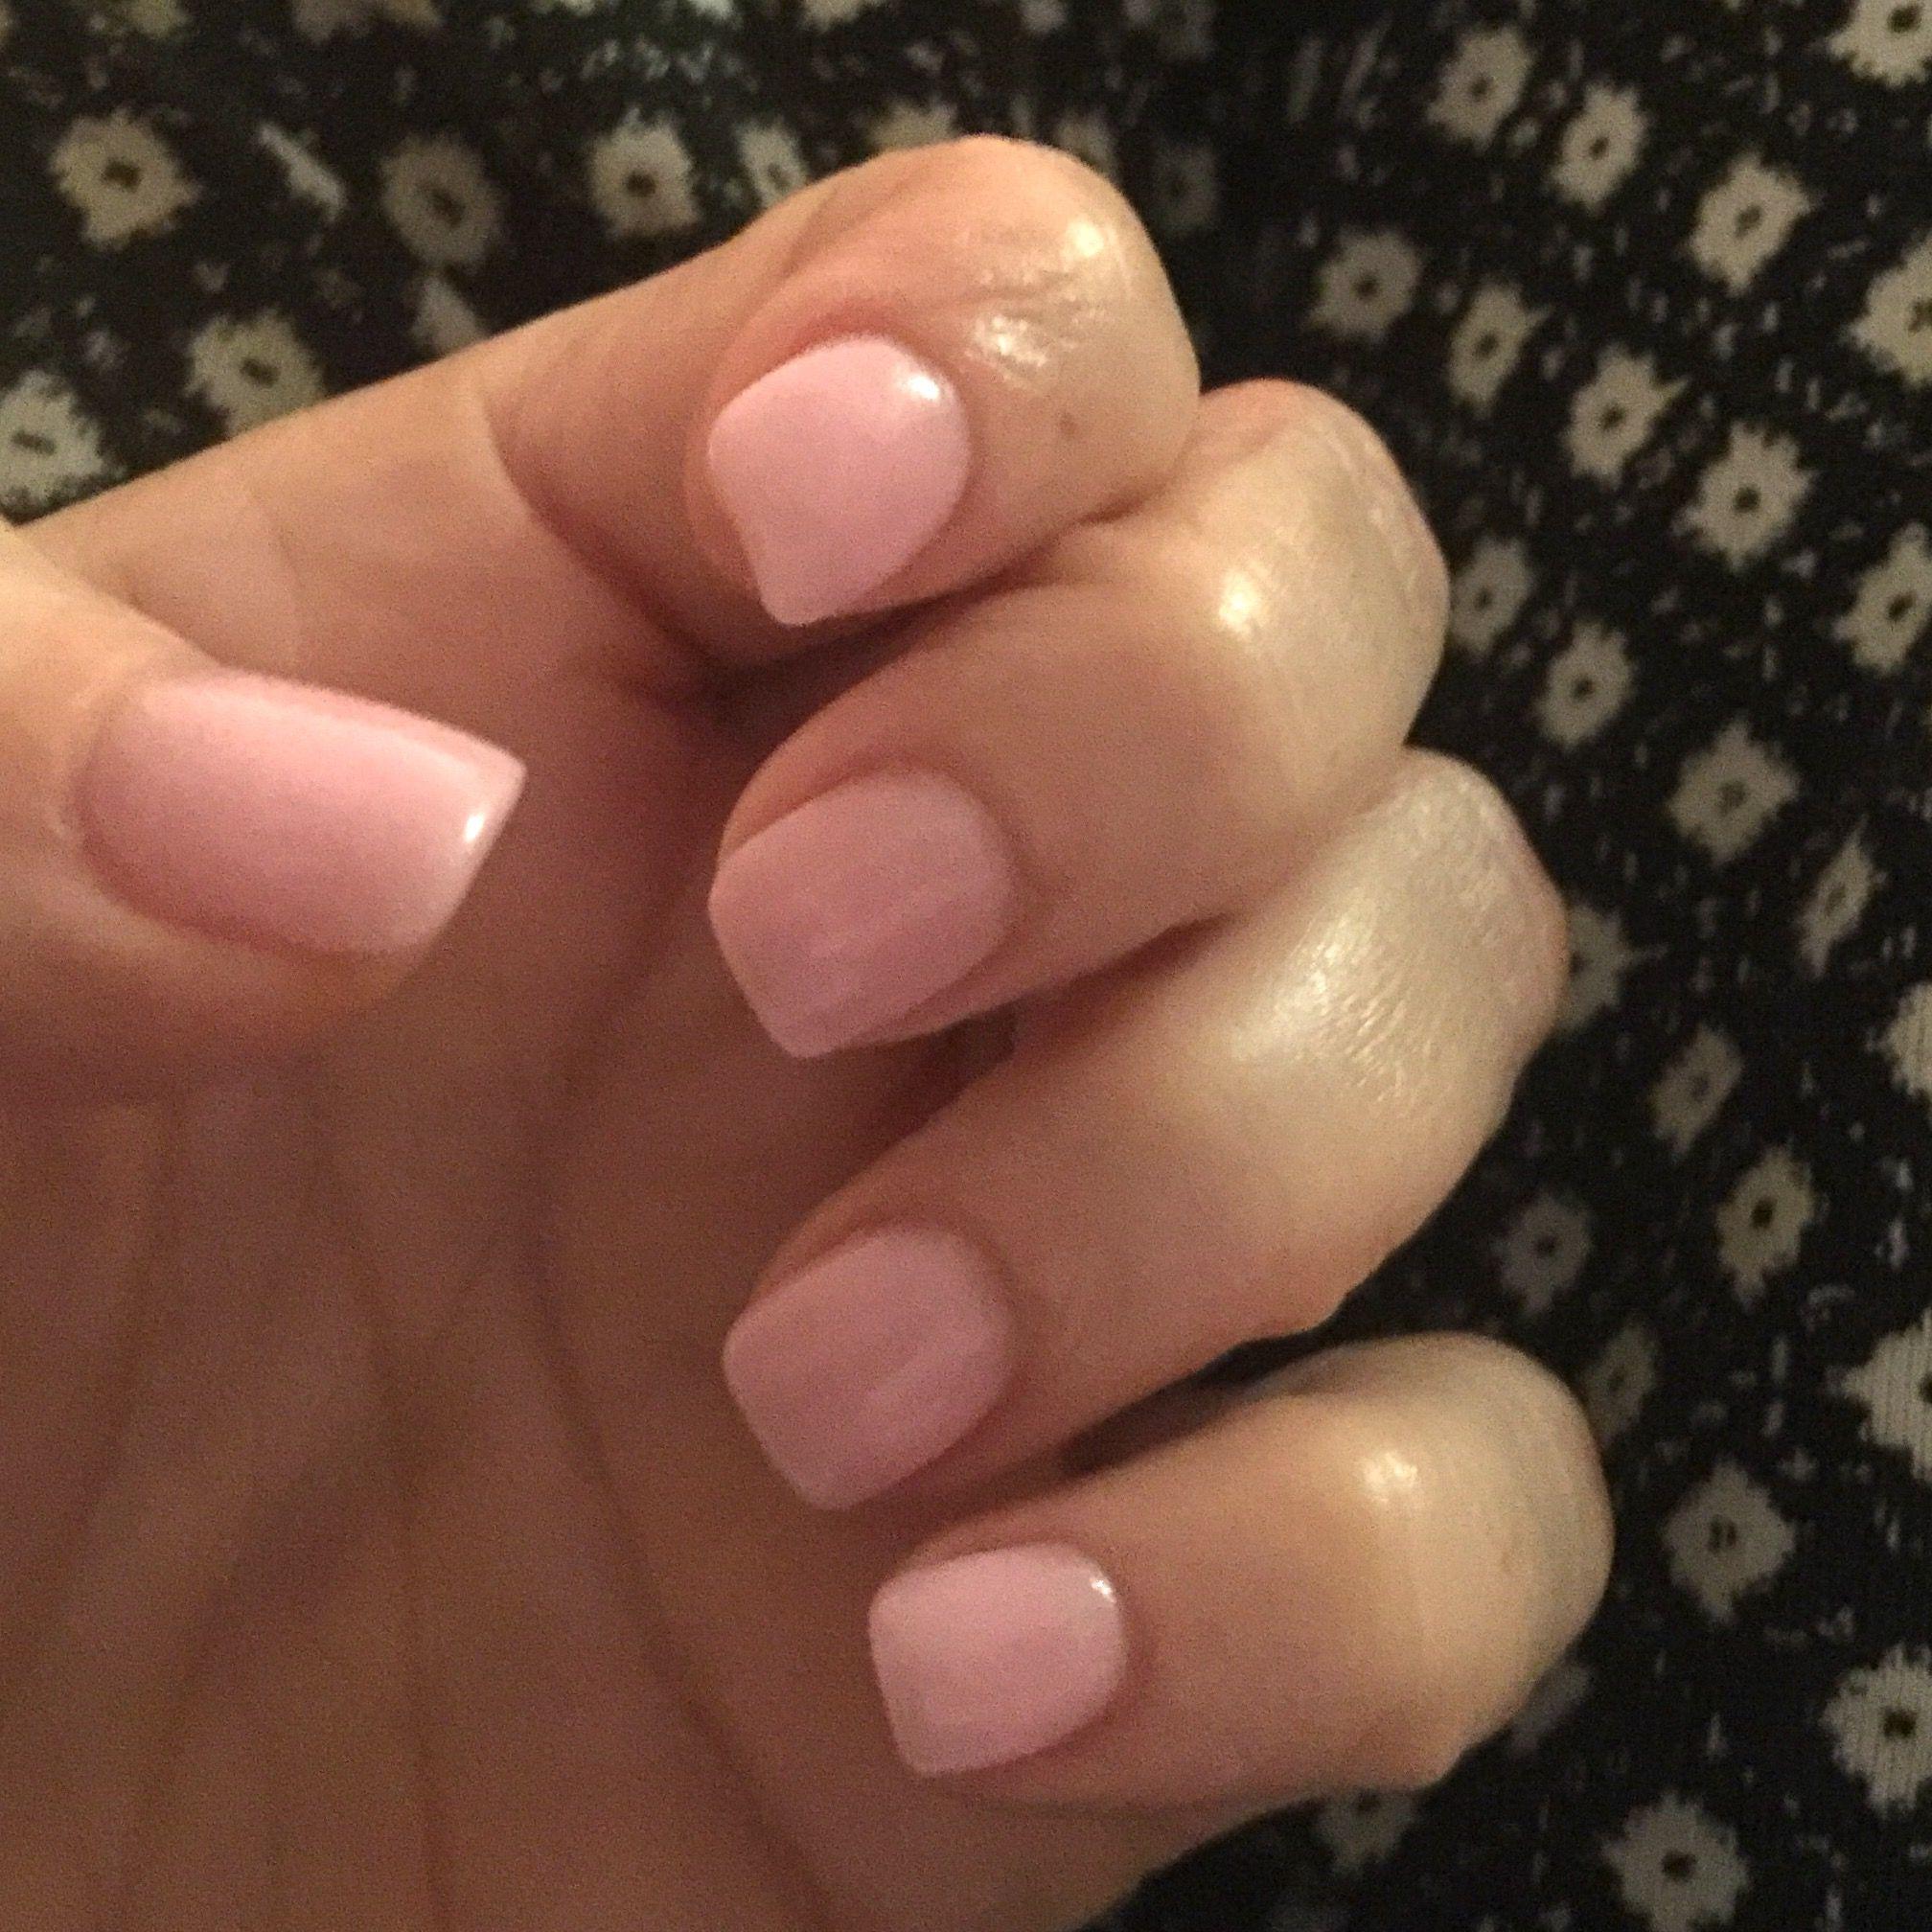 Nexgen Color C21 Pampano Nexgen Nails Colors Nexgen Nails Nextgen Nail Colors